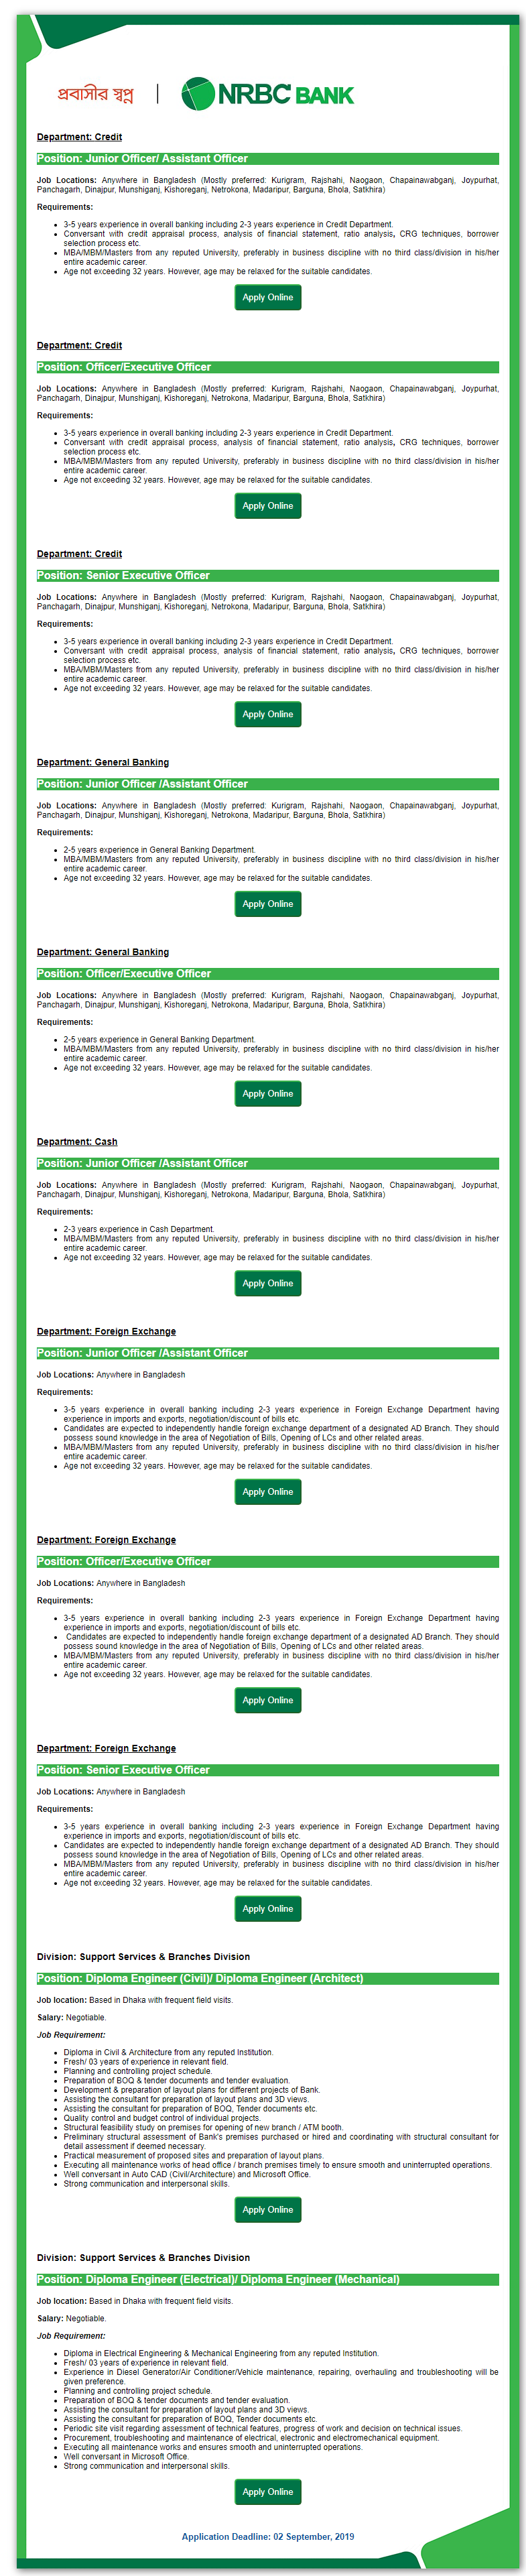 NRB commercial Bank Job Circular 2019